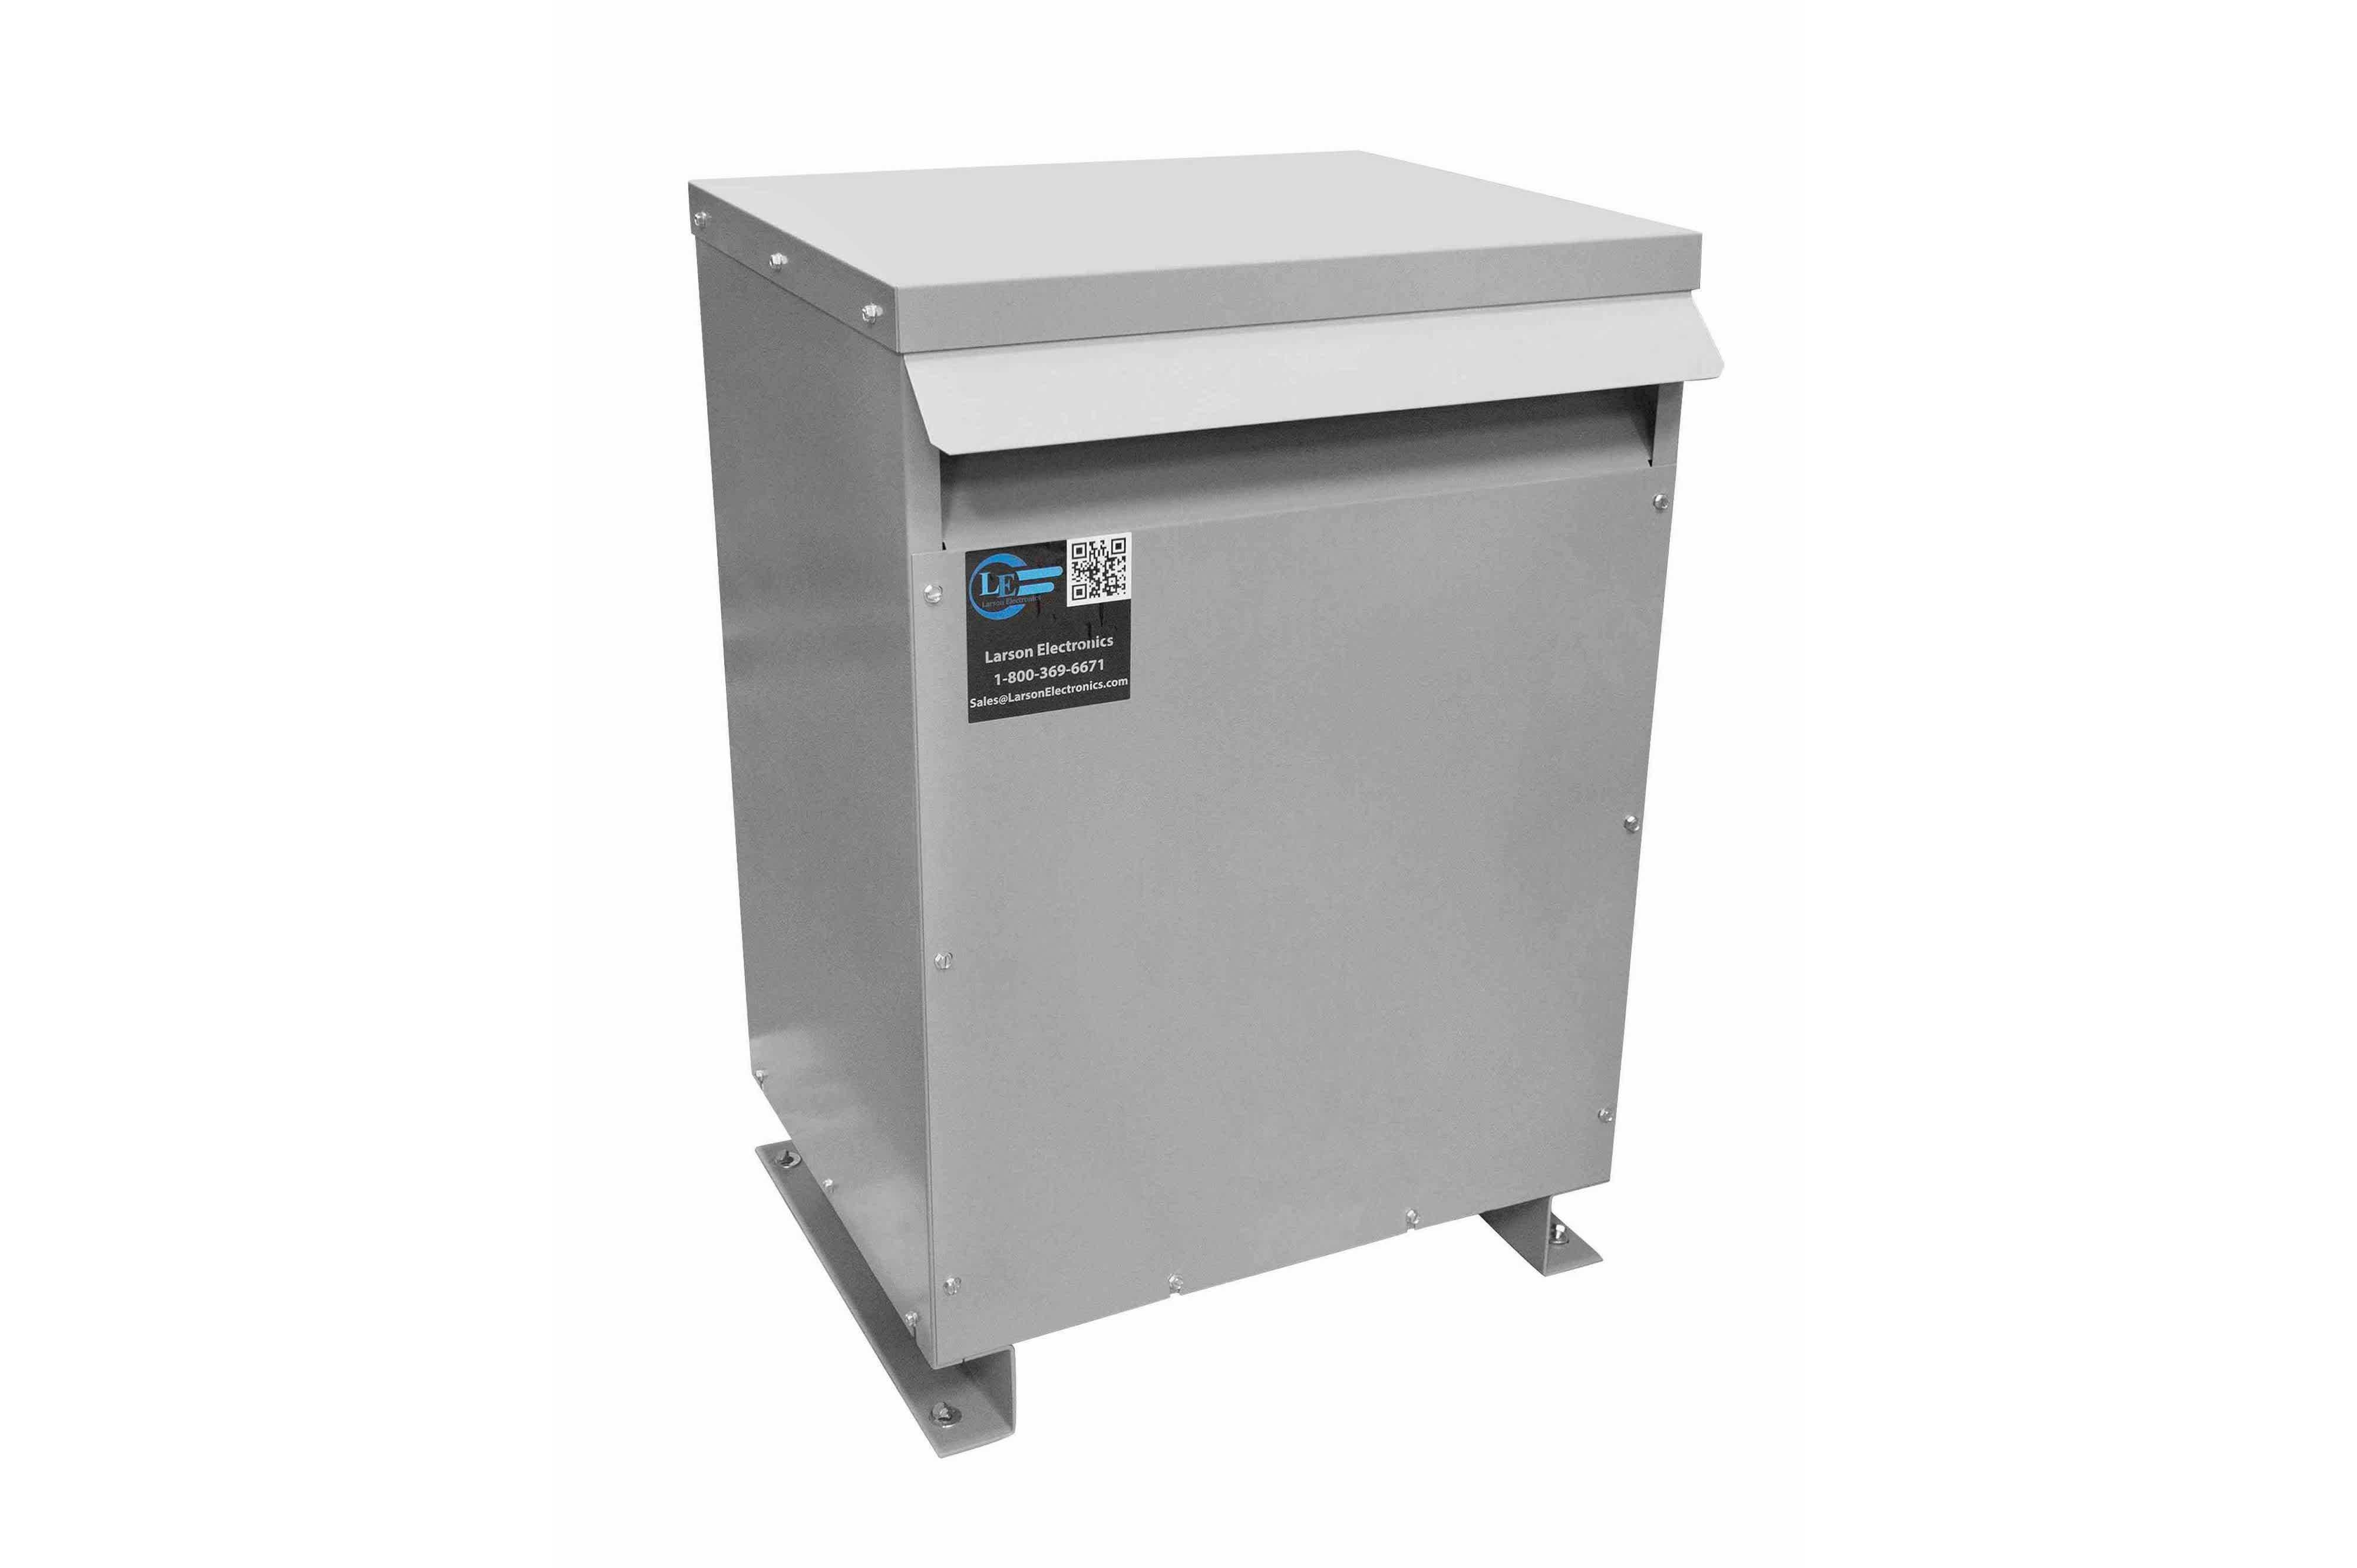 250 kVA 3PH Isolation Transformer, 208V Wye Primary, 600Y/347 Wye-N Secondary, N3R, Ventilated, 60 Hz